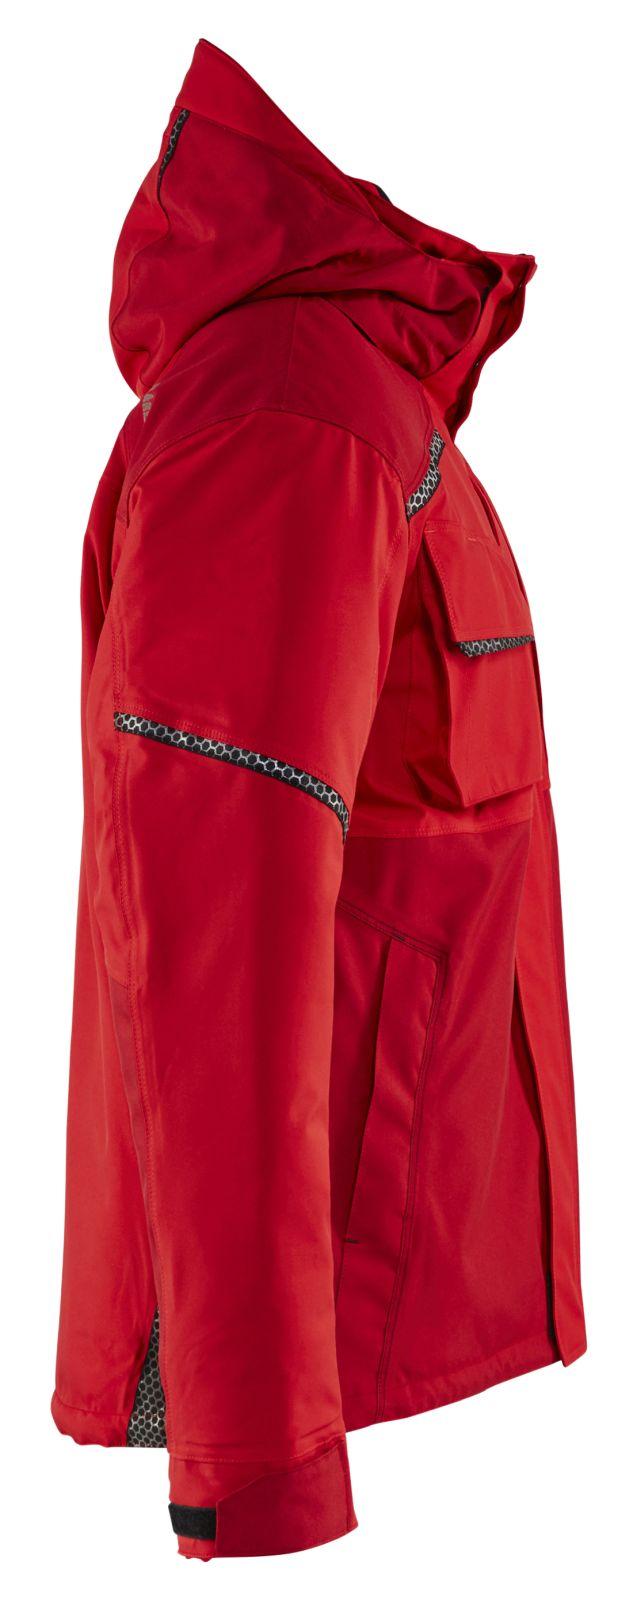 Blaklader Jassen 48811987 rood-donkerrood(5658)